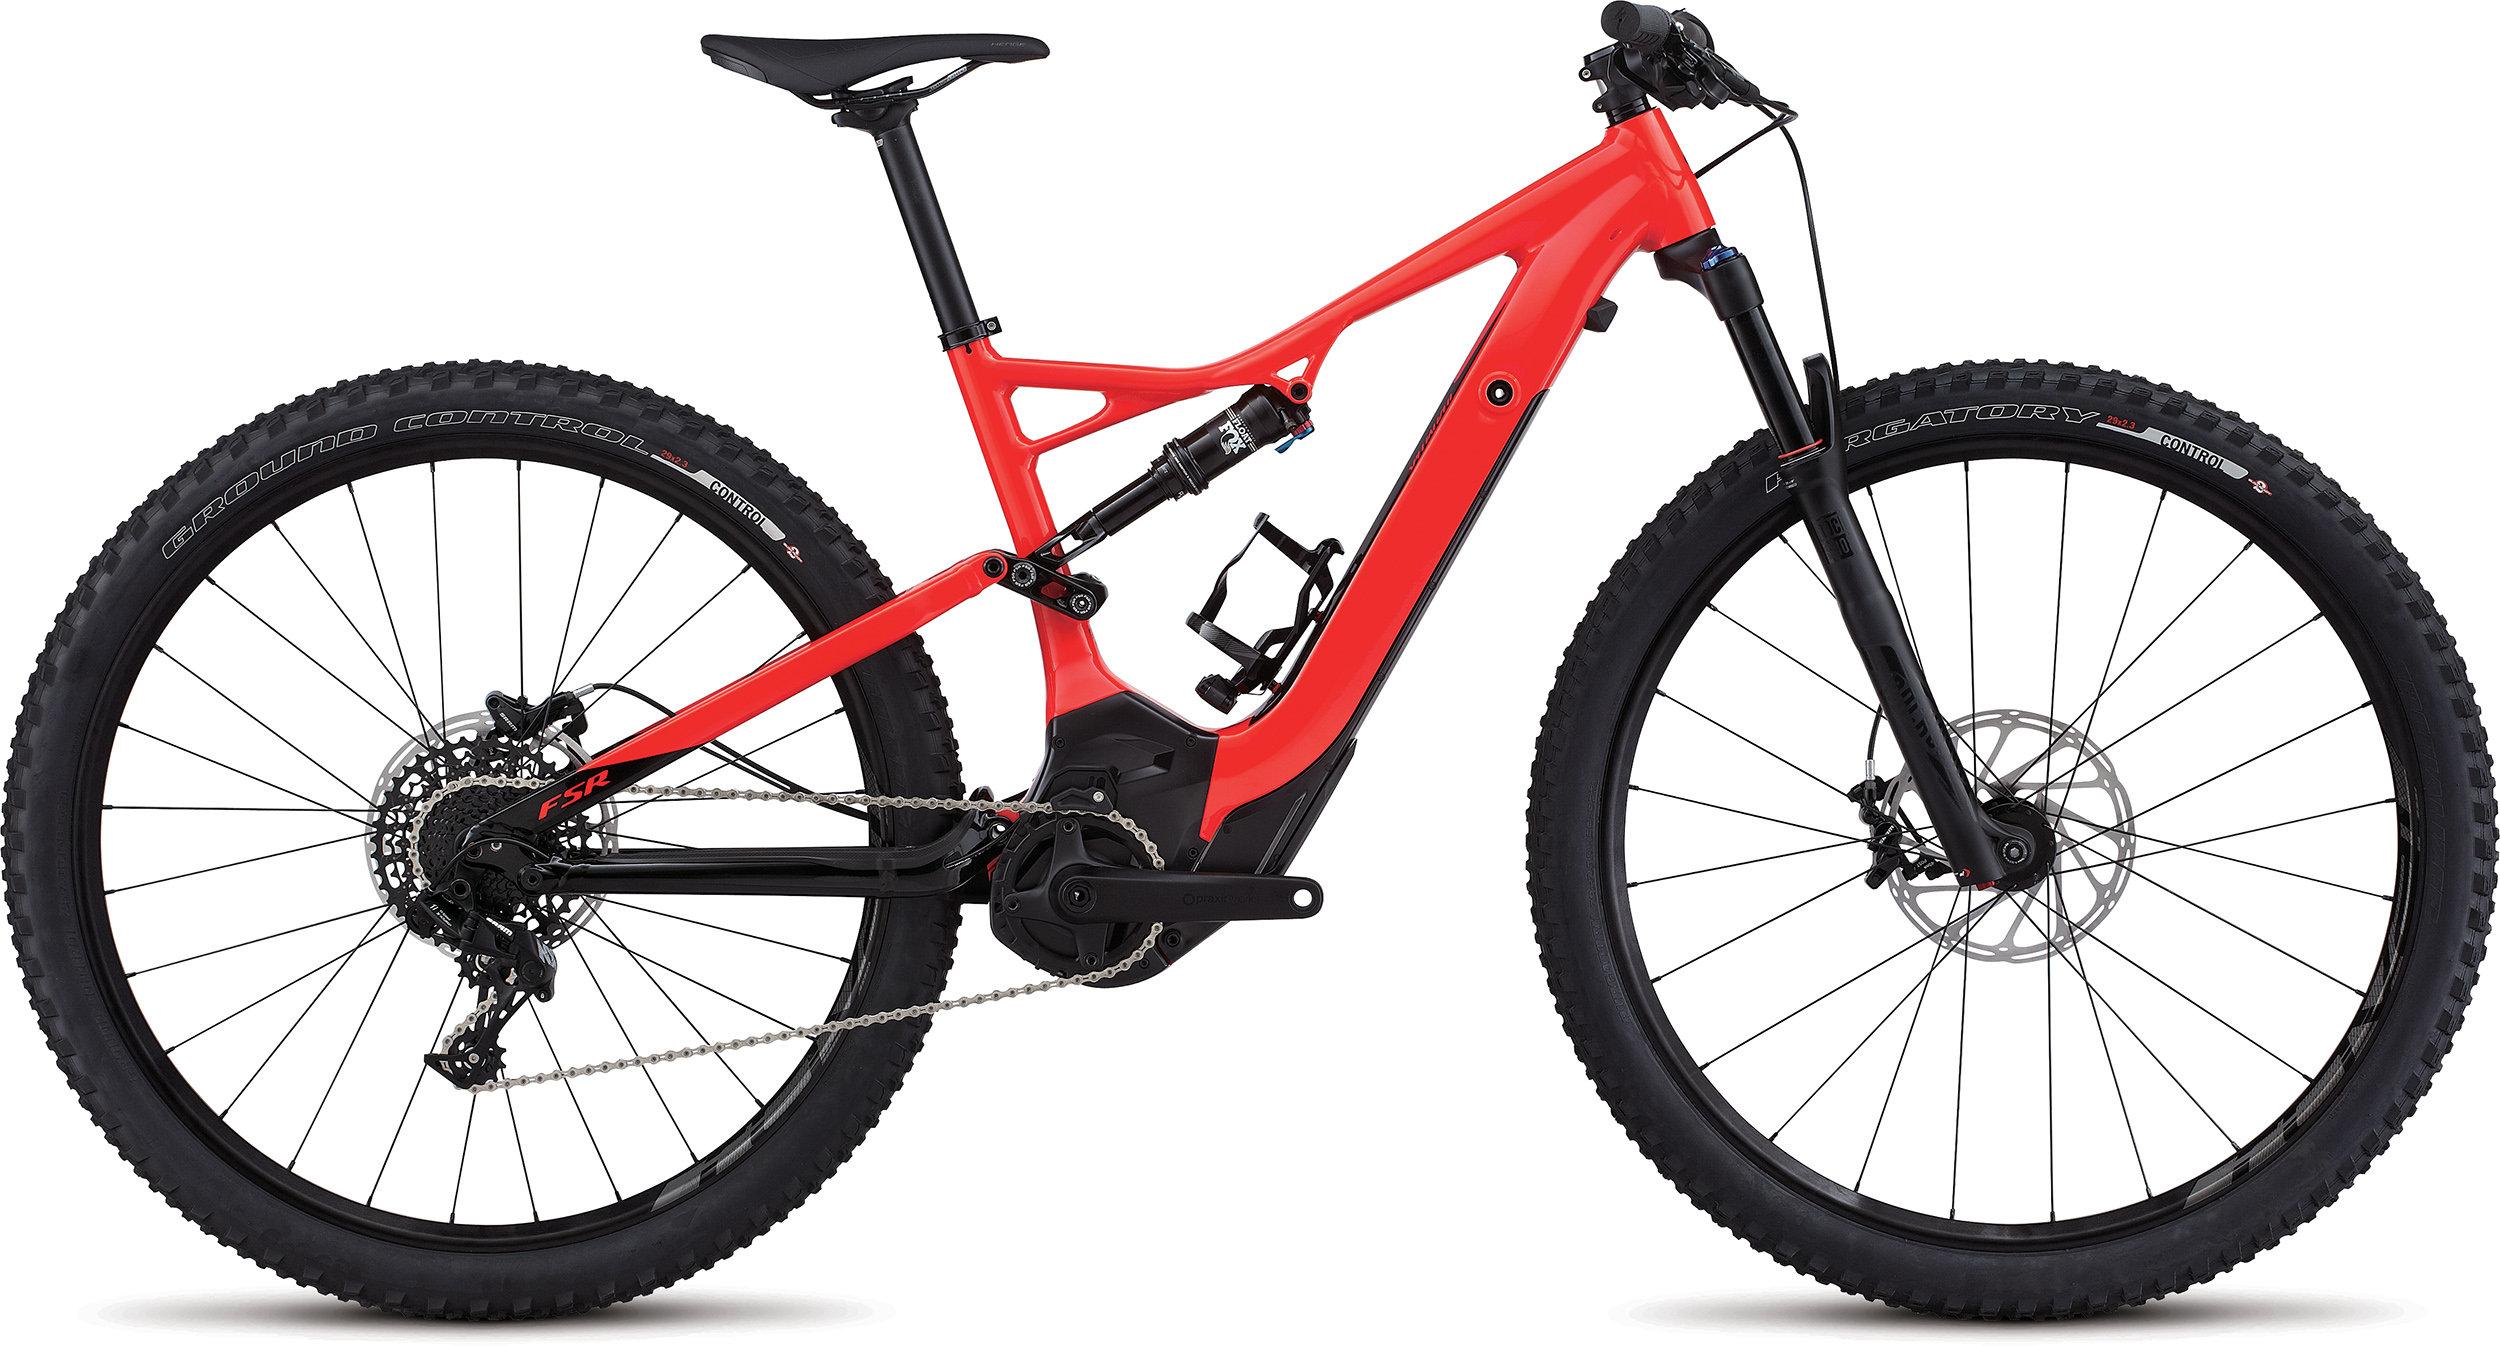 SPECIALIZED LEVO FSR ST 29 CE RKTRED/BLK S - Randen Bike GmbH